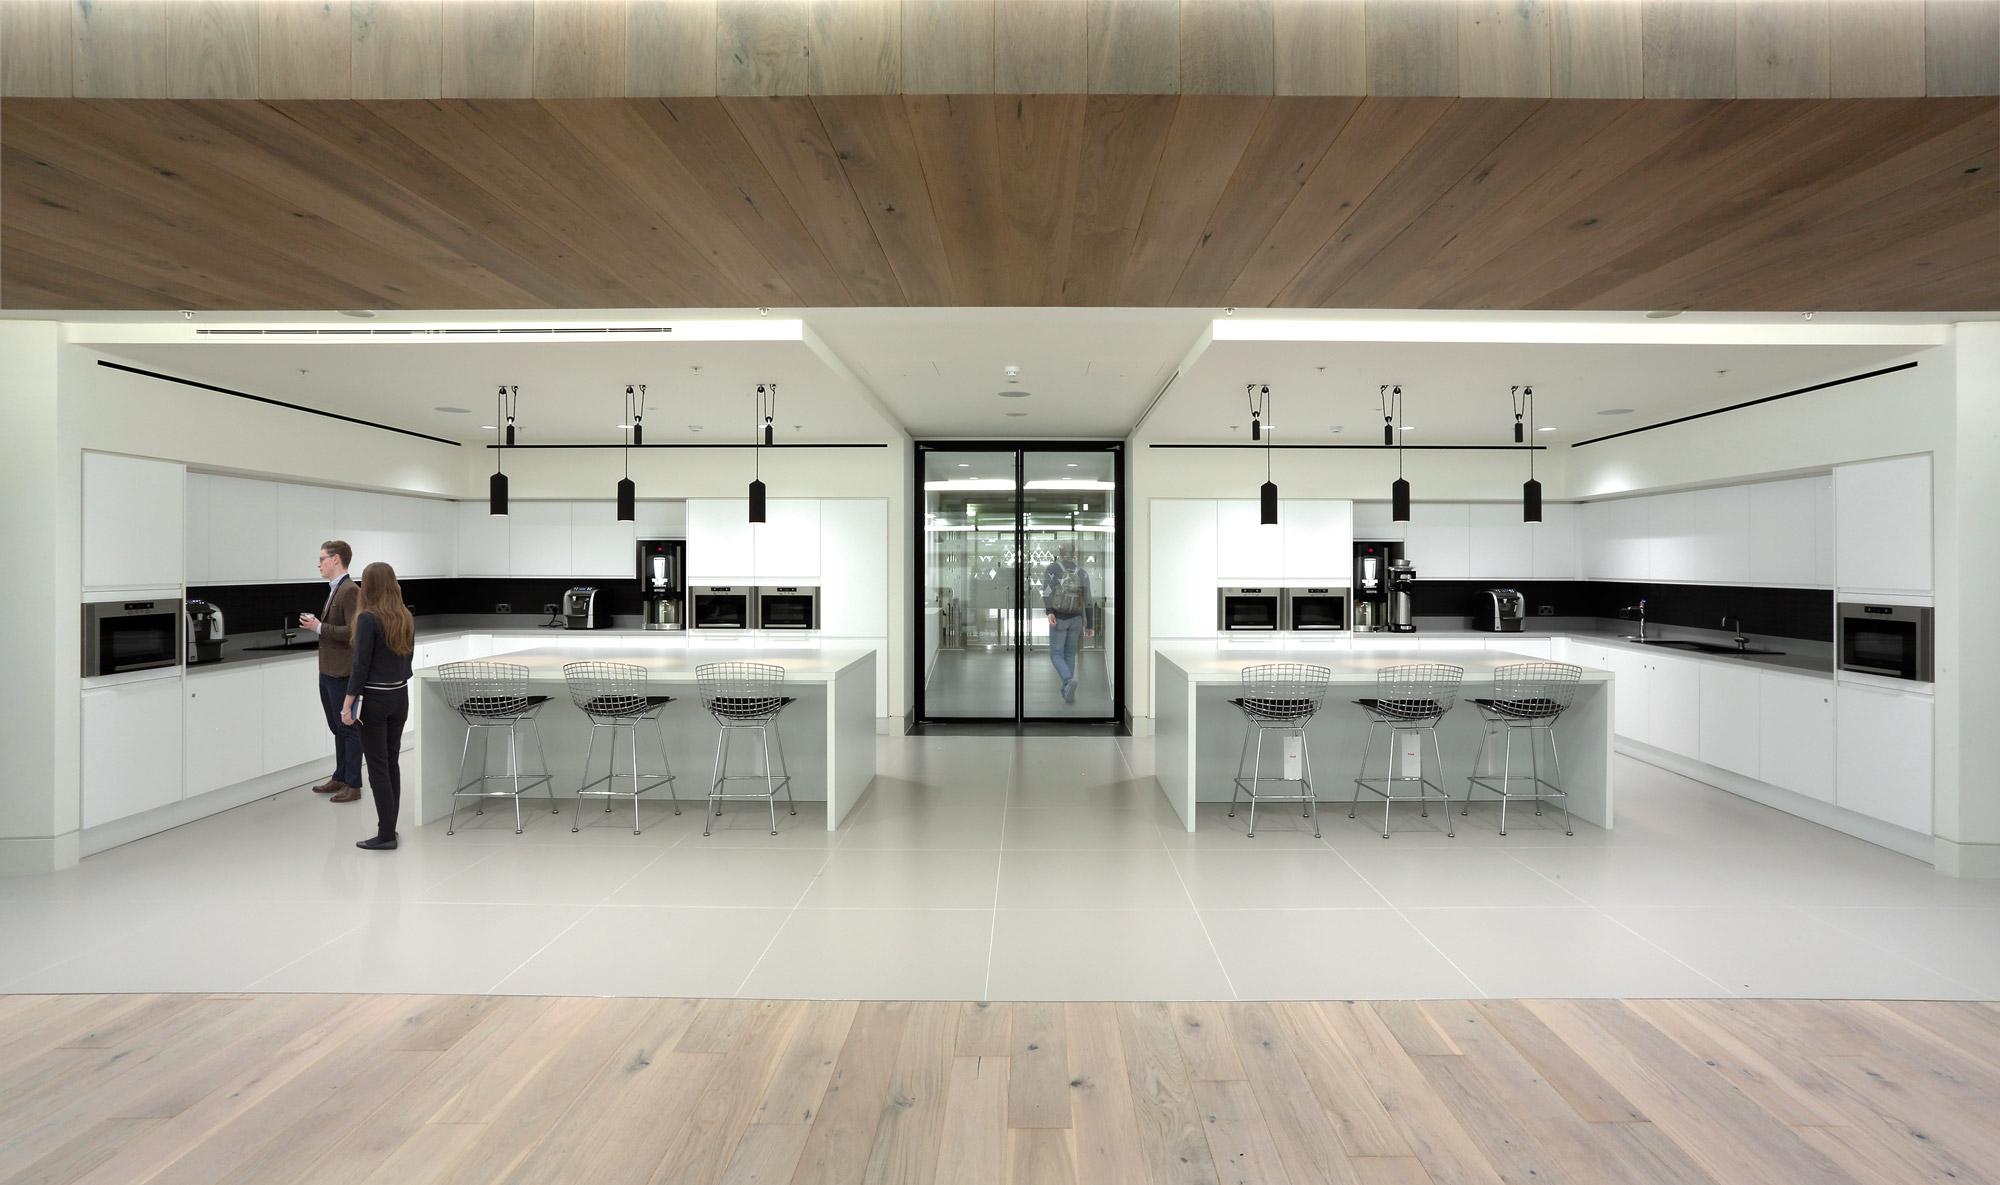 Spacelab_Coller_Capital_kitchen.jpg